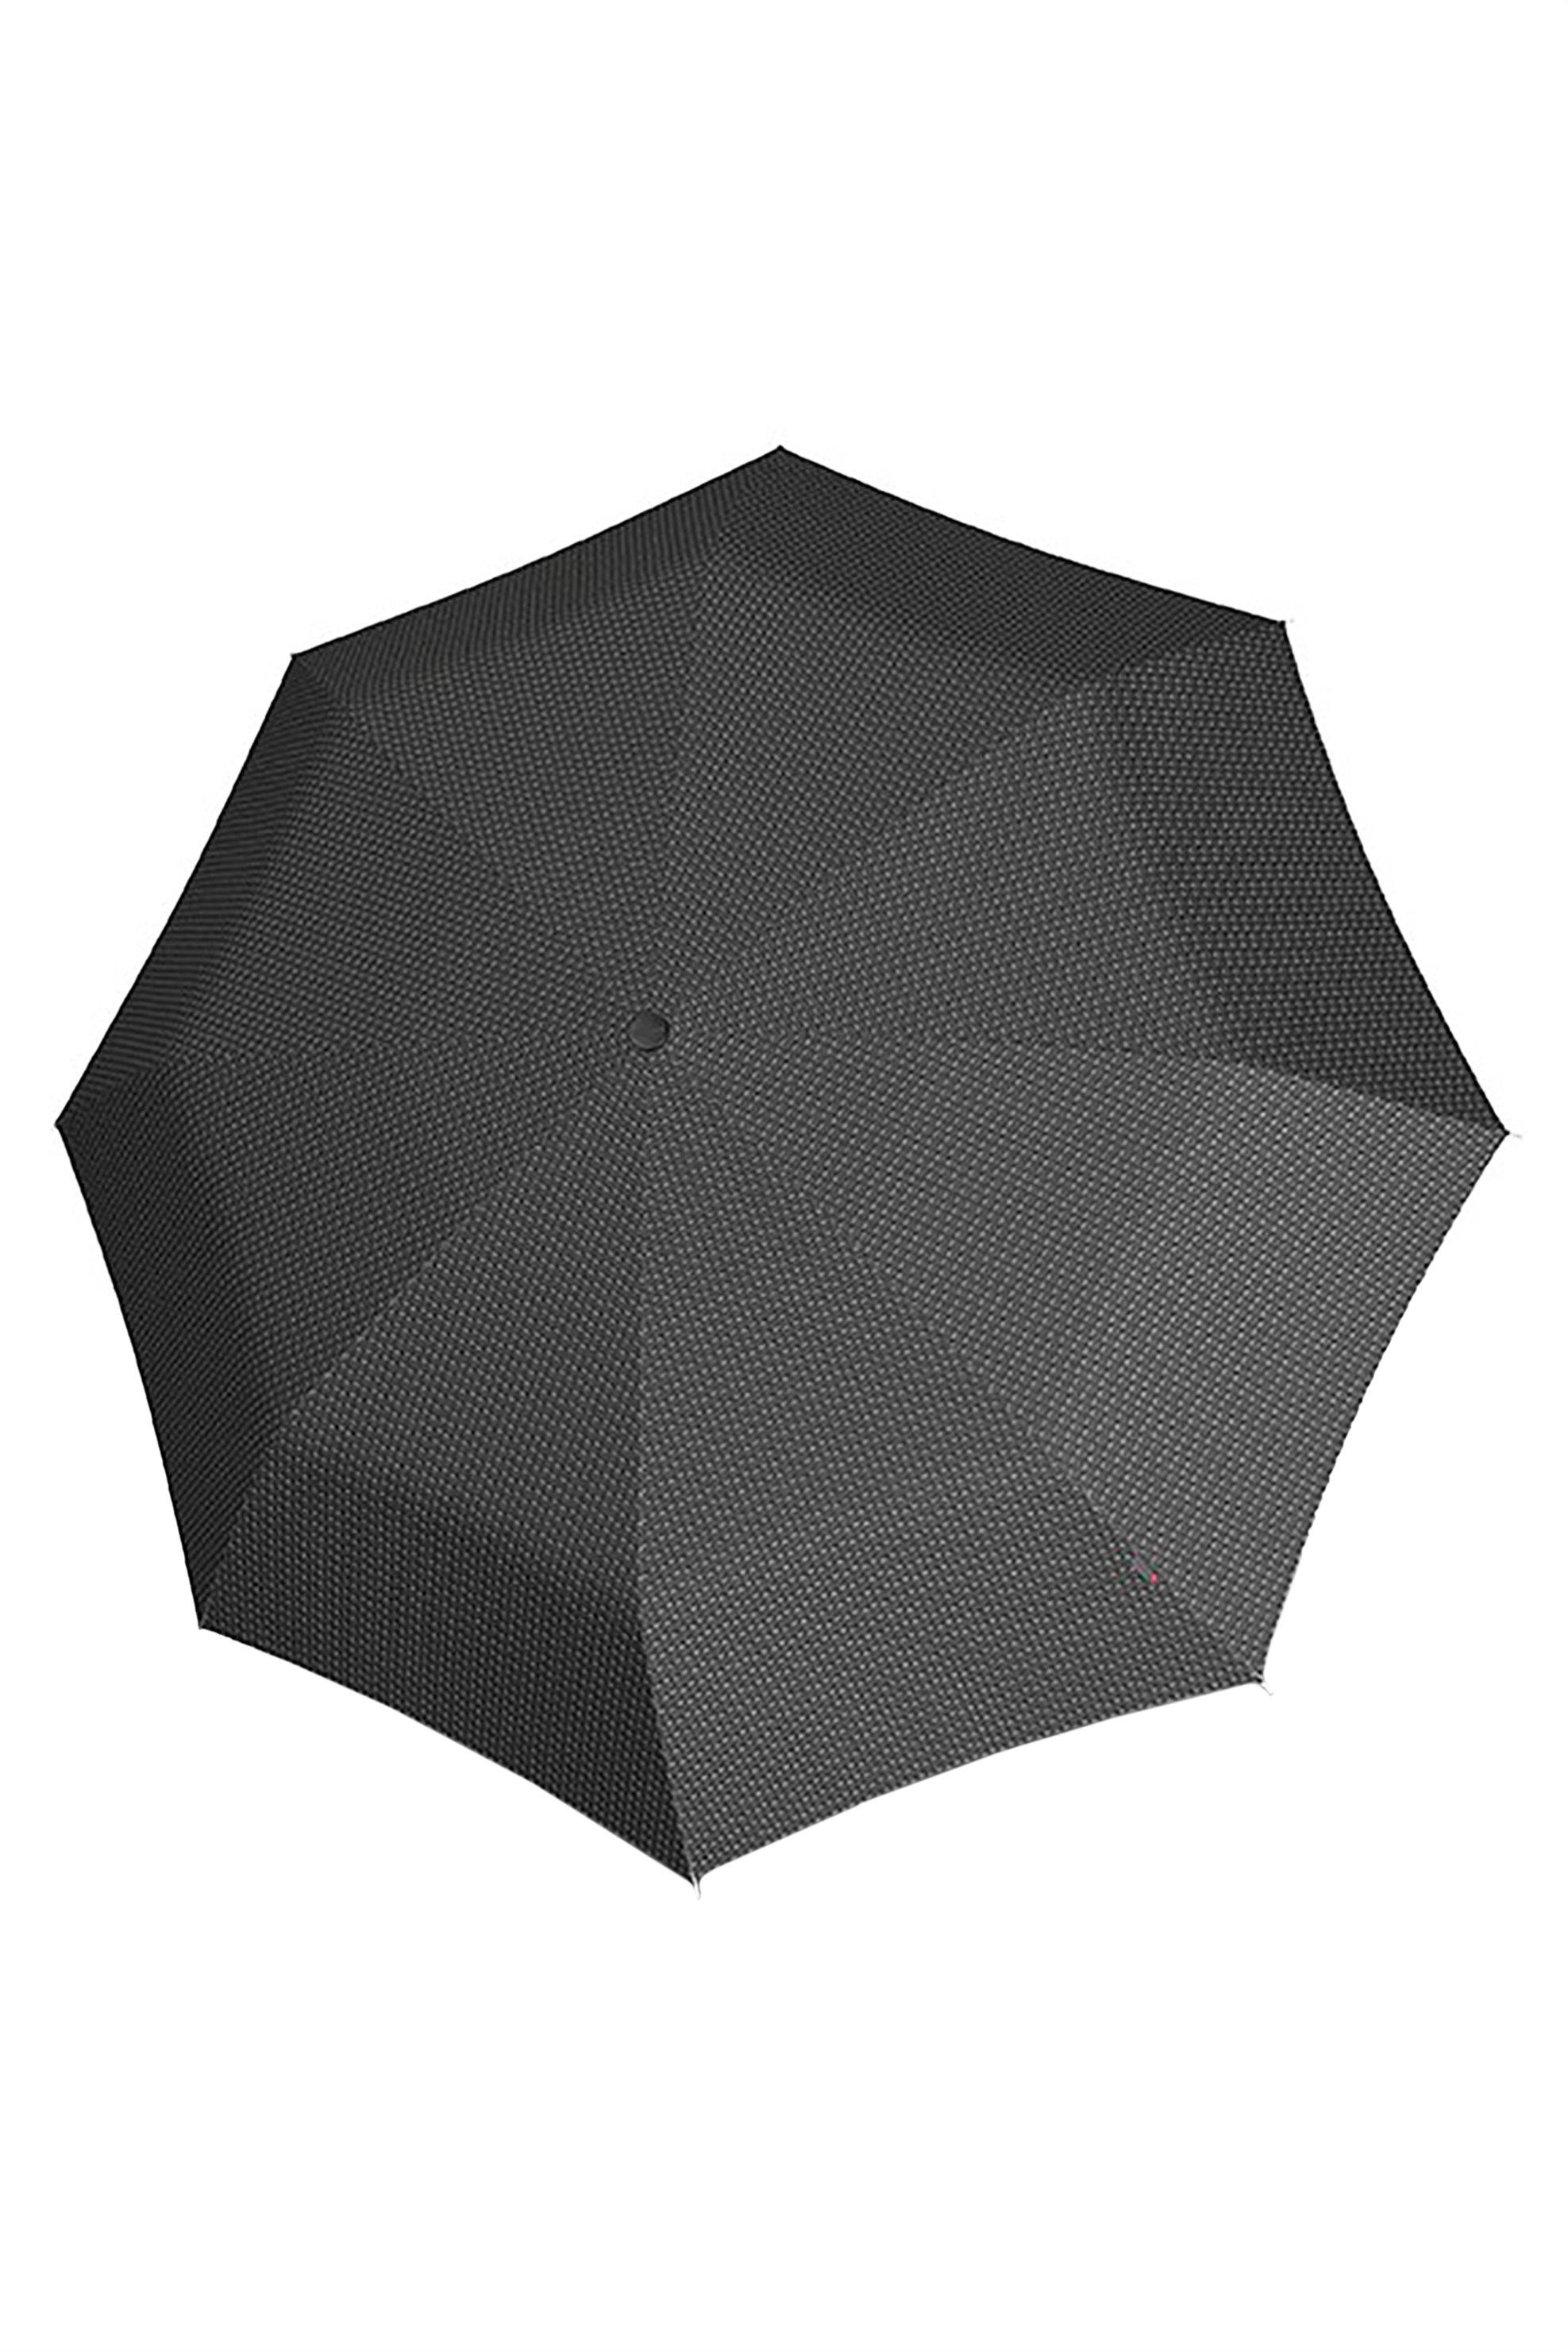 Knirps πτυσσόμενη ομπρέλα με print ''Duomatic'' - KNUM72008354